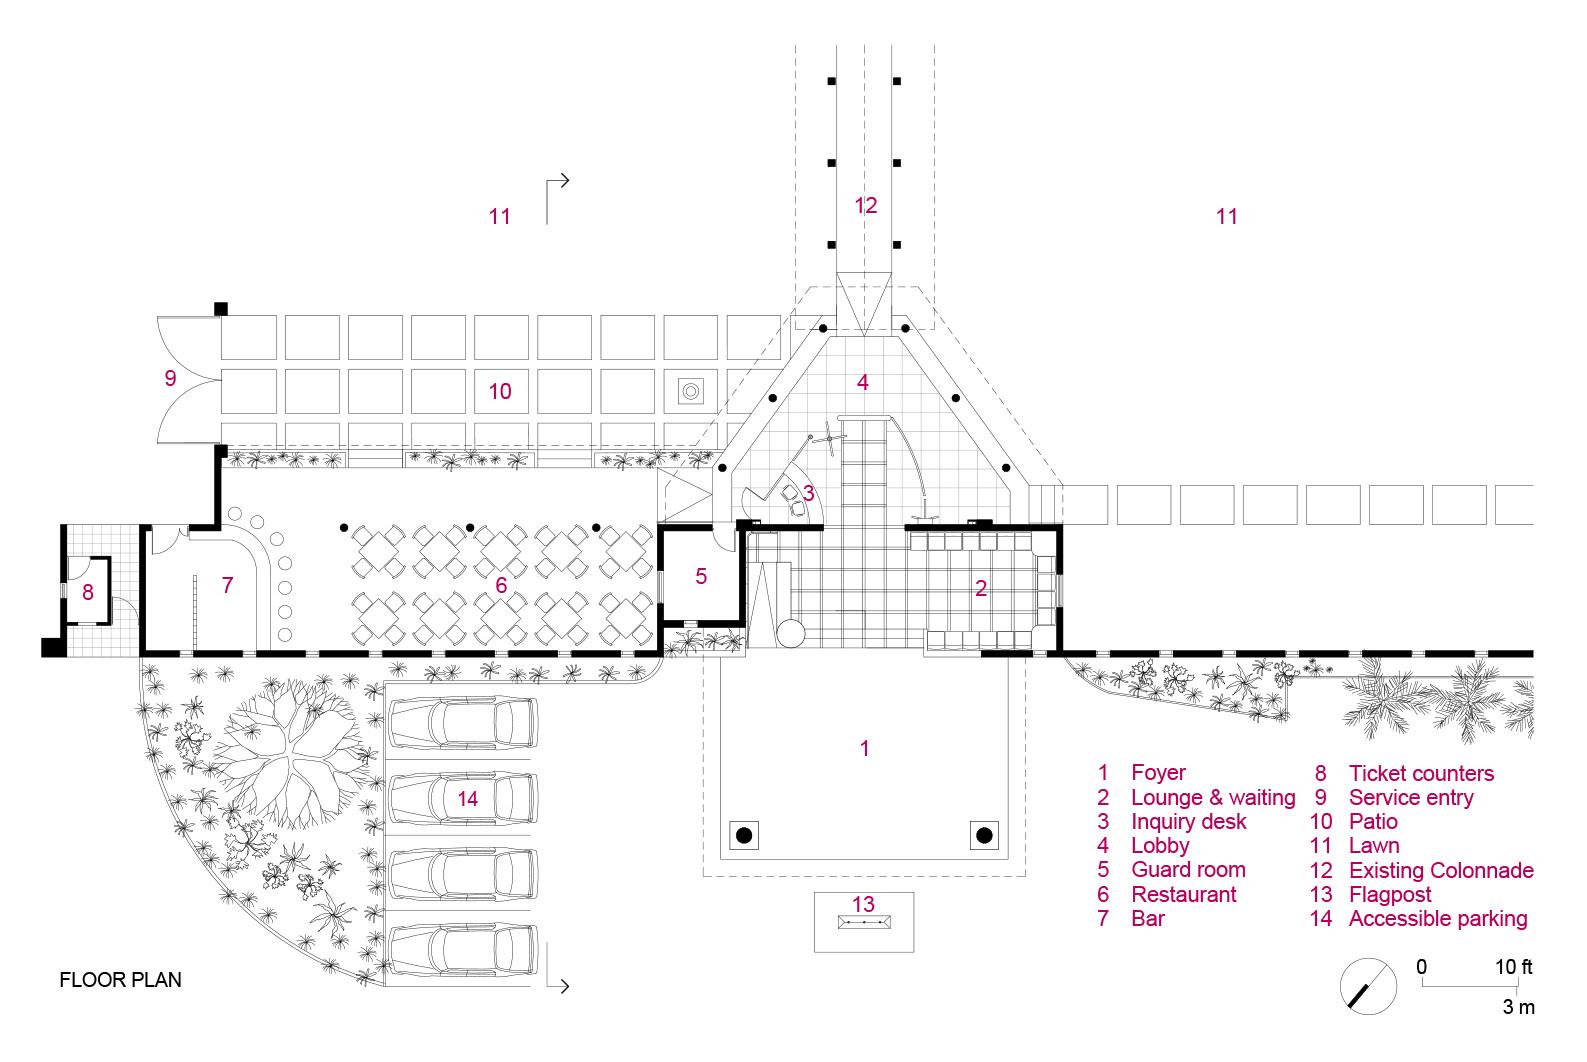 c:userspublicdocumentsmy3_ssc_2013.pdf